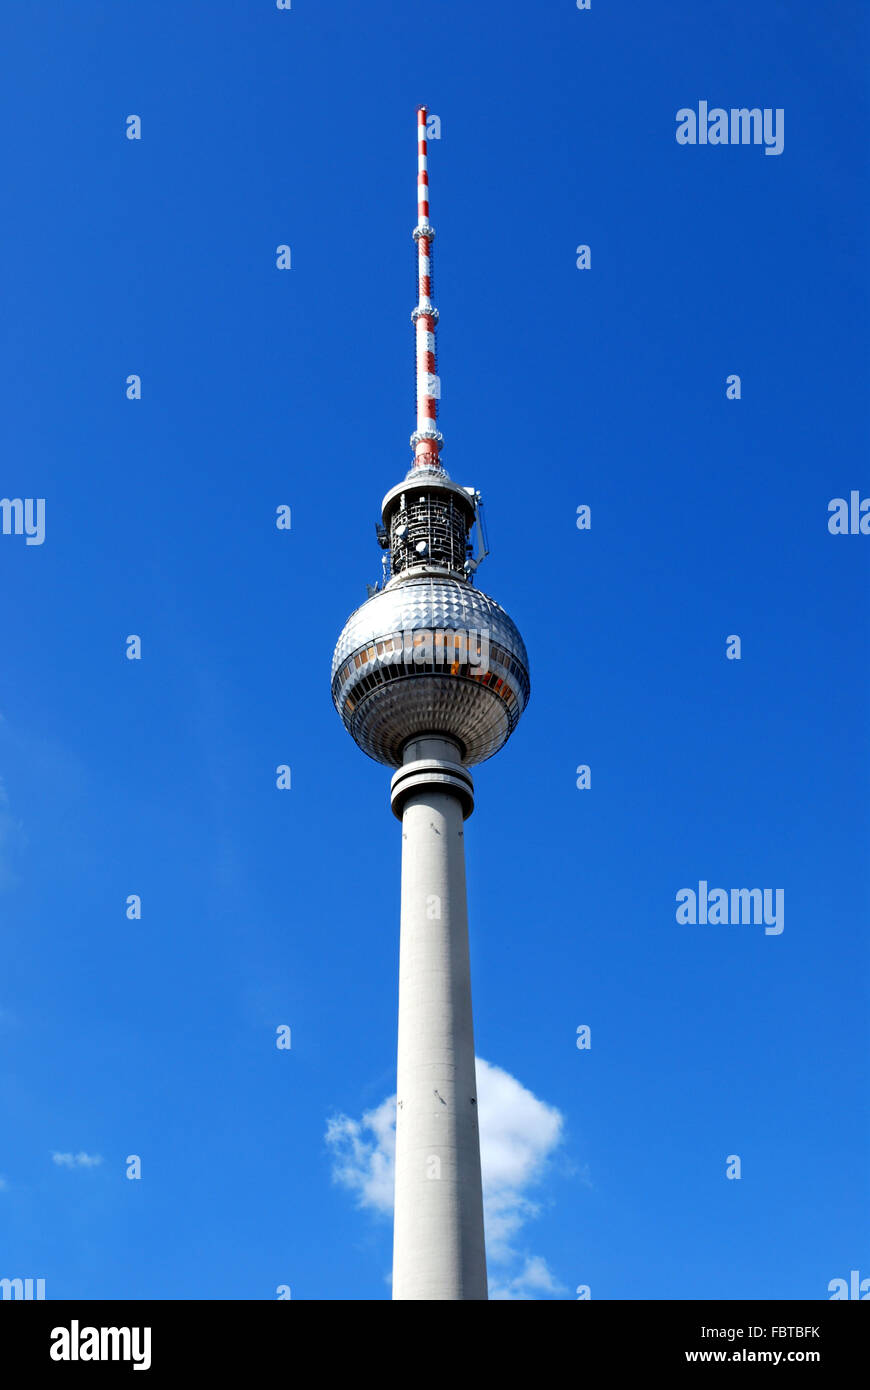 berlin alexanderplatz with ty tower - Stock Image